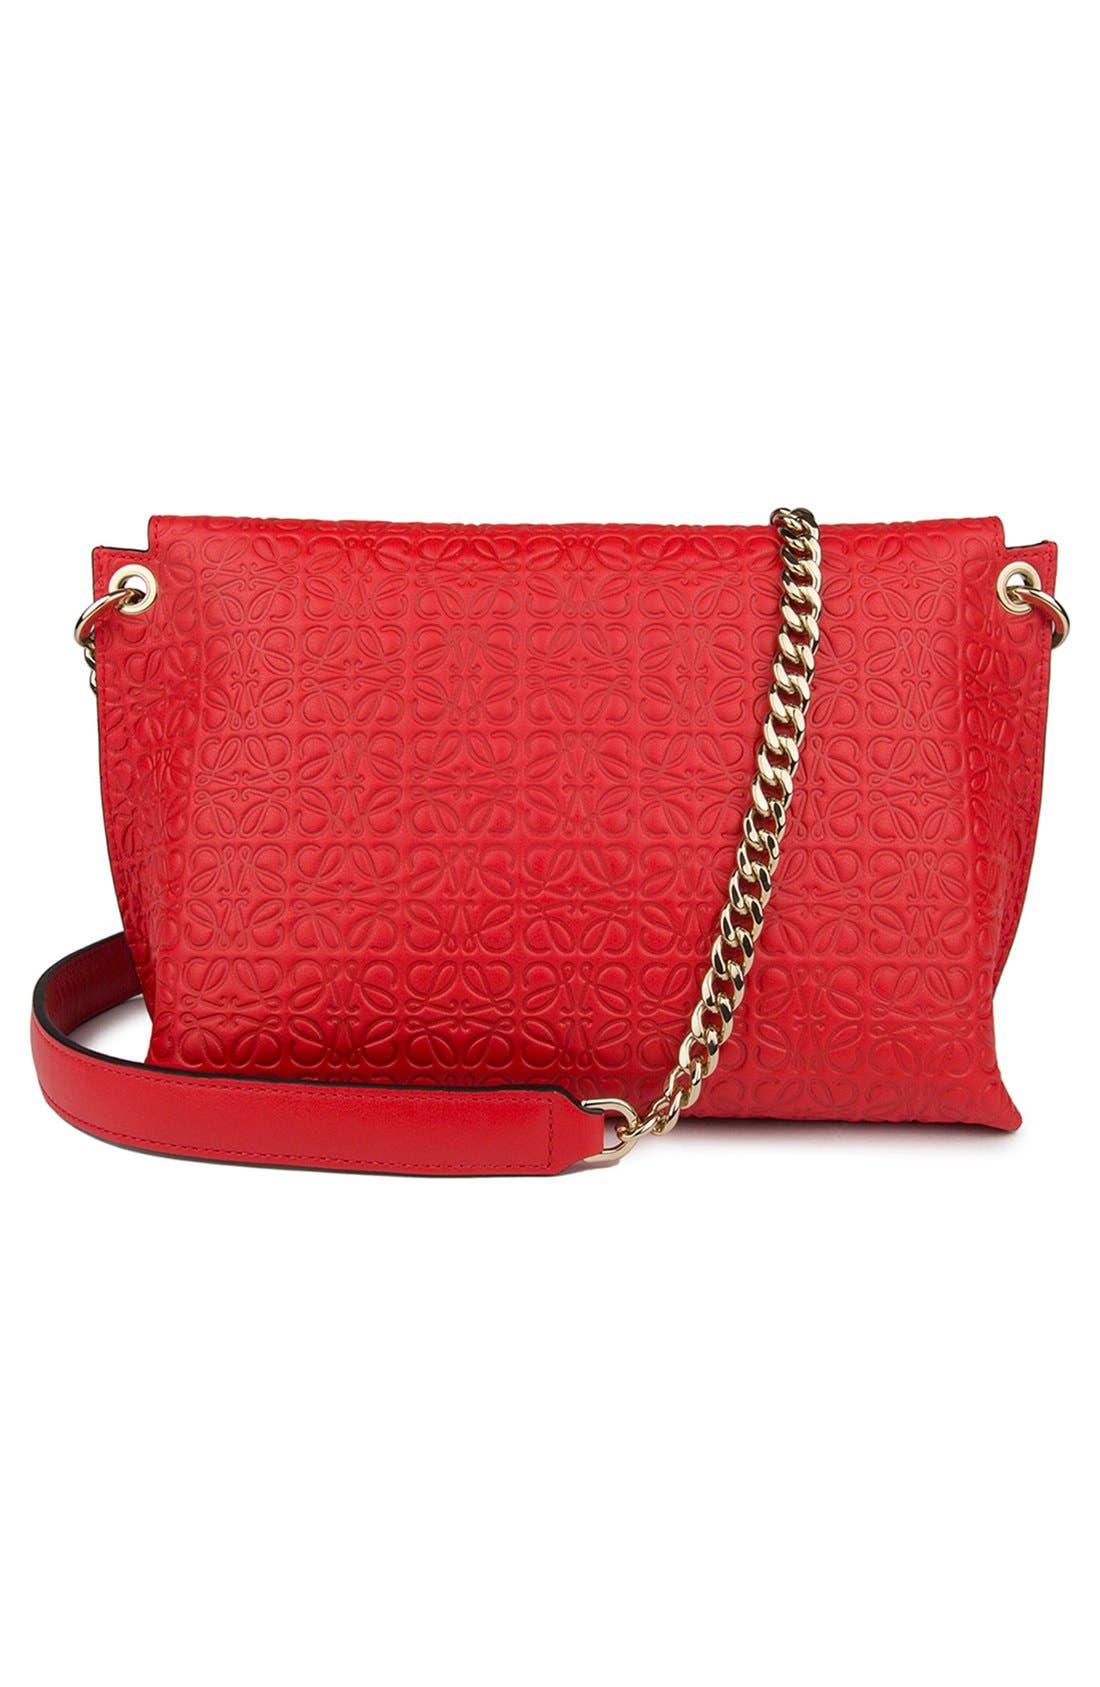 Alternate Image 2  - Loewe 'Avenue' Embossed Calfskin Leather Crossbody Bag